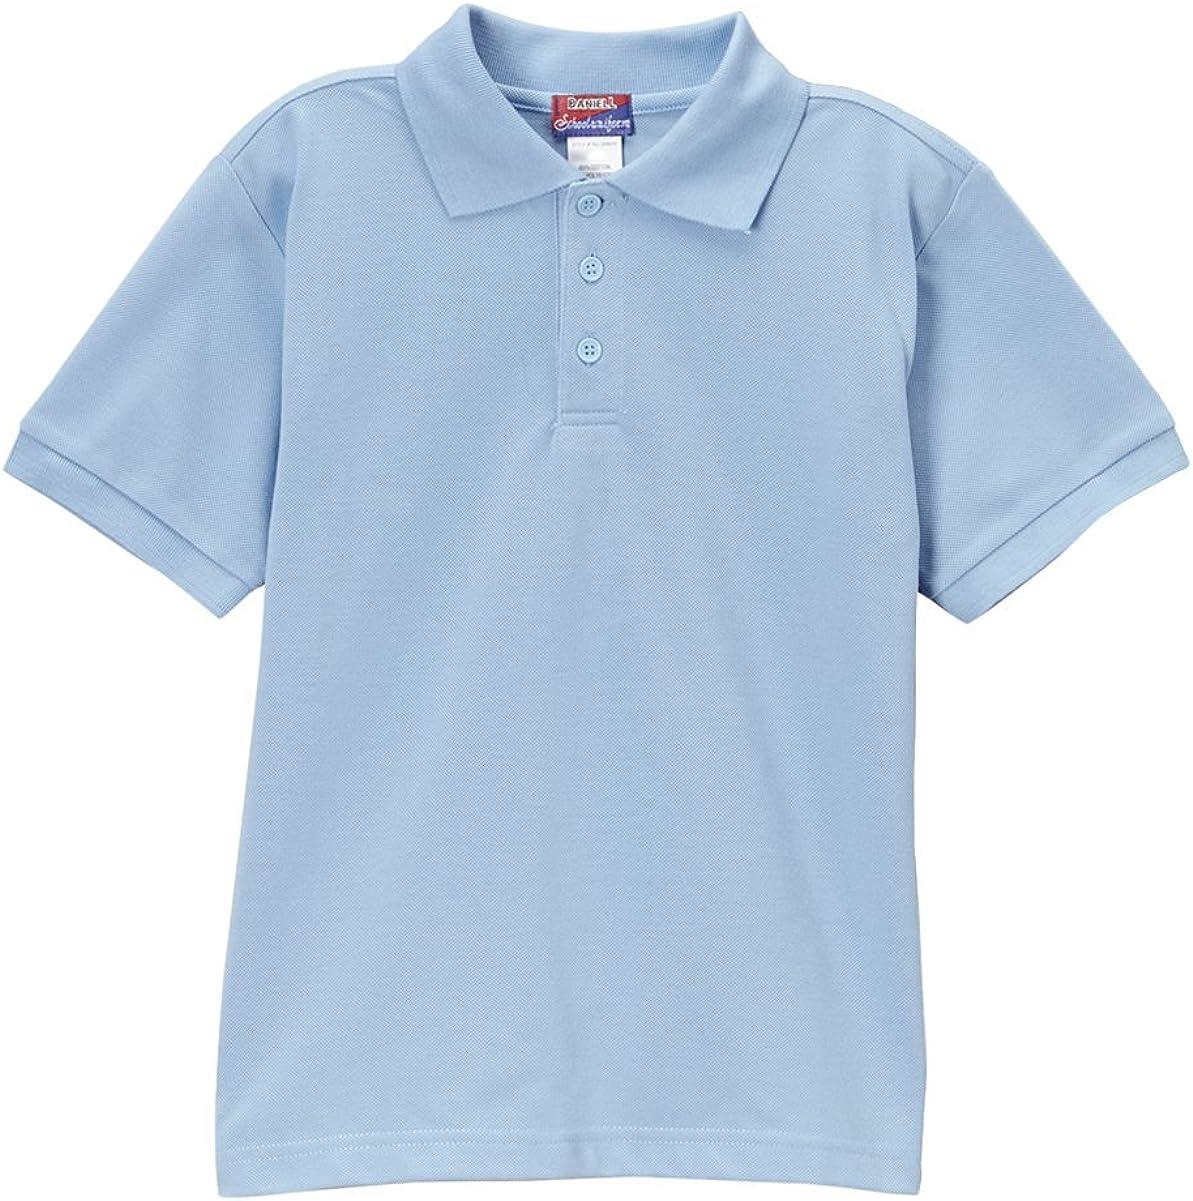 iGirldress Boys School Uniform Pique Polo Shirt Short Sleeve UNBSU01